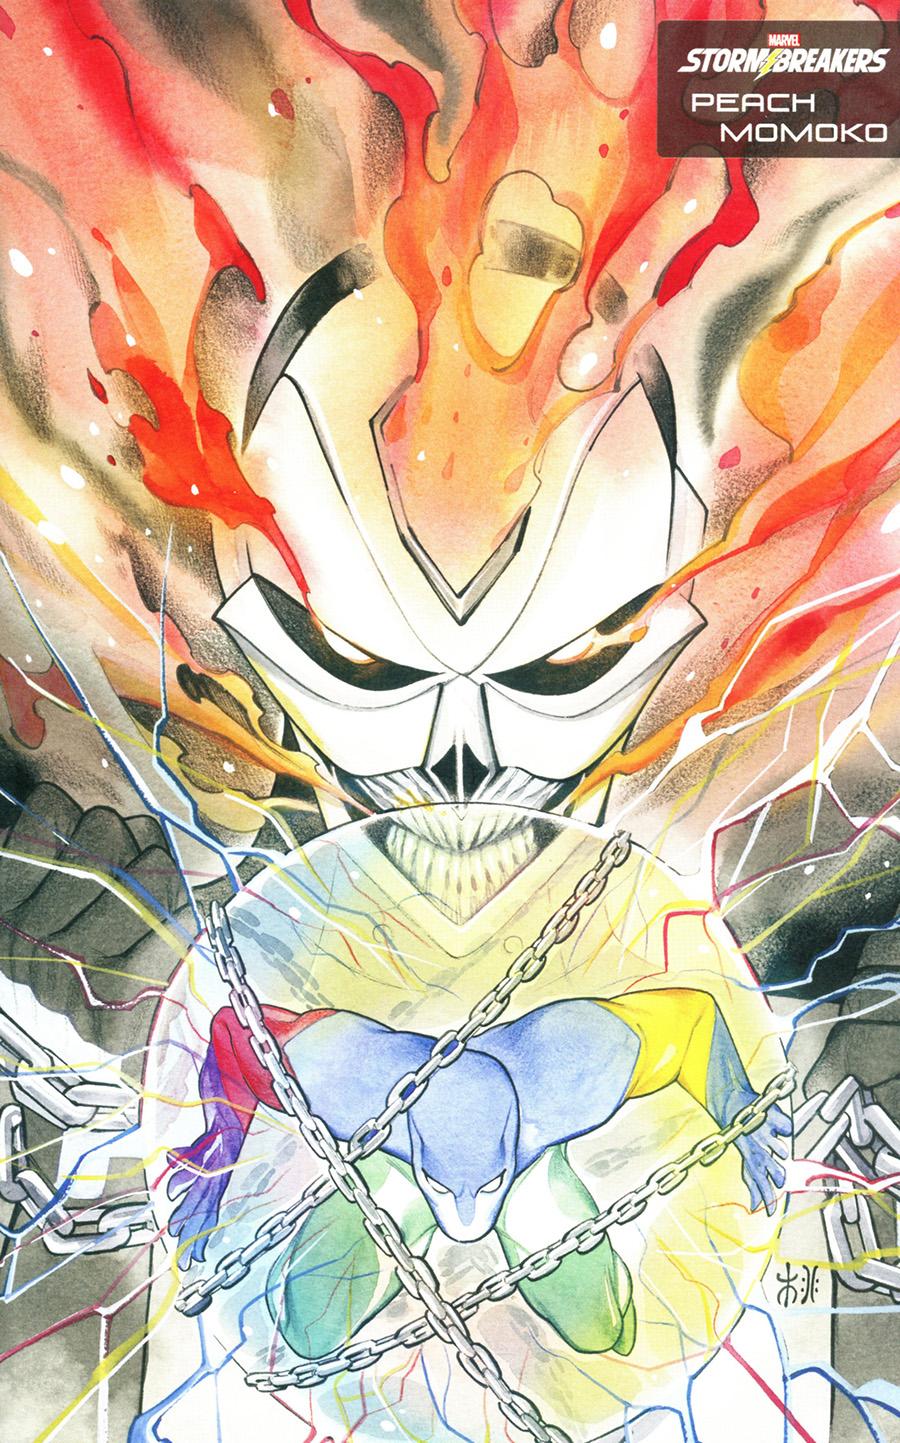 Heroes Reborn #3 Cover D Variant Peach Momoko Stormbreakers Cover